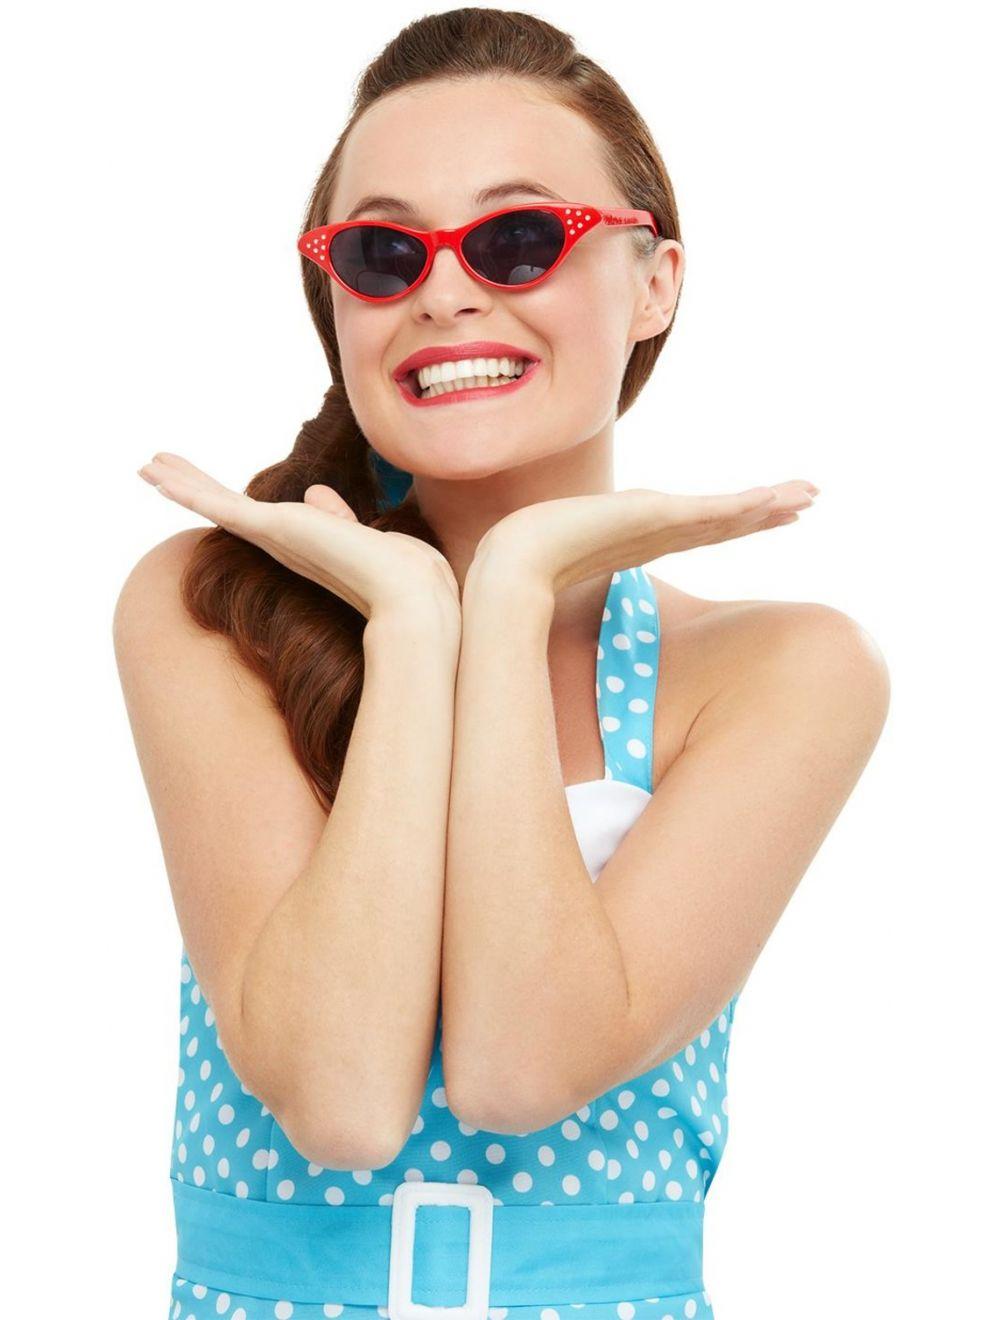 f88b276c80 Flyaway Style Rock and Roll Sunglasses - 50769 - Fancy Dress Ball